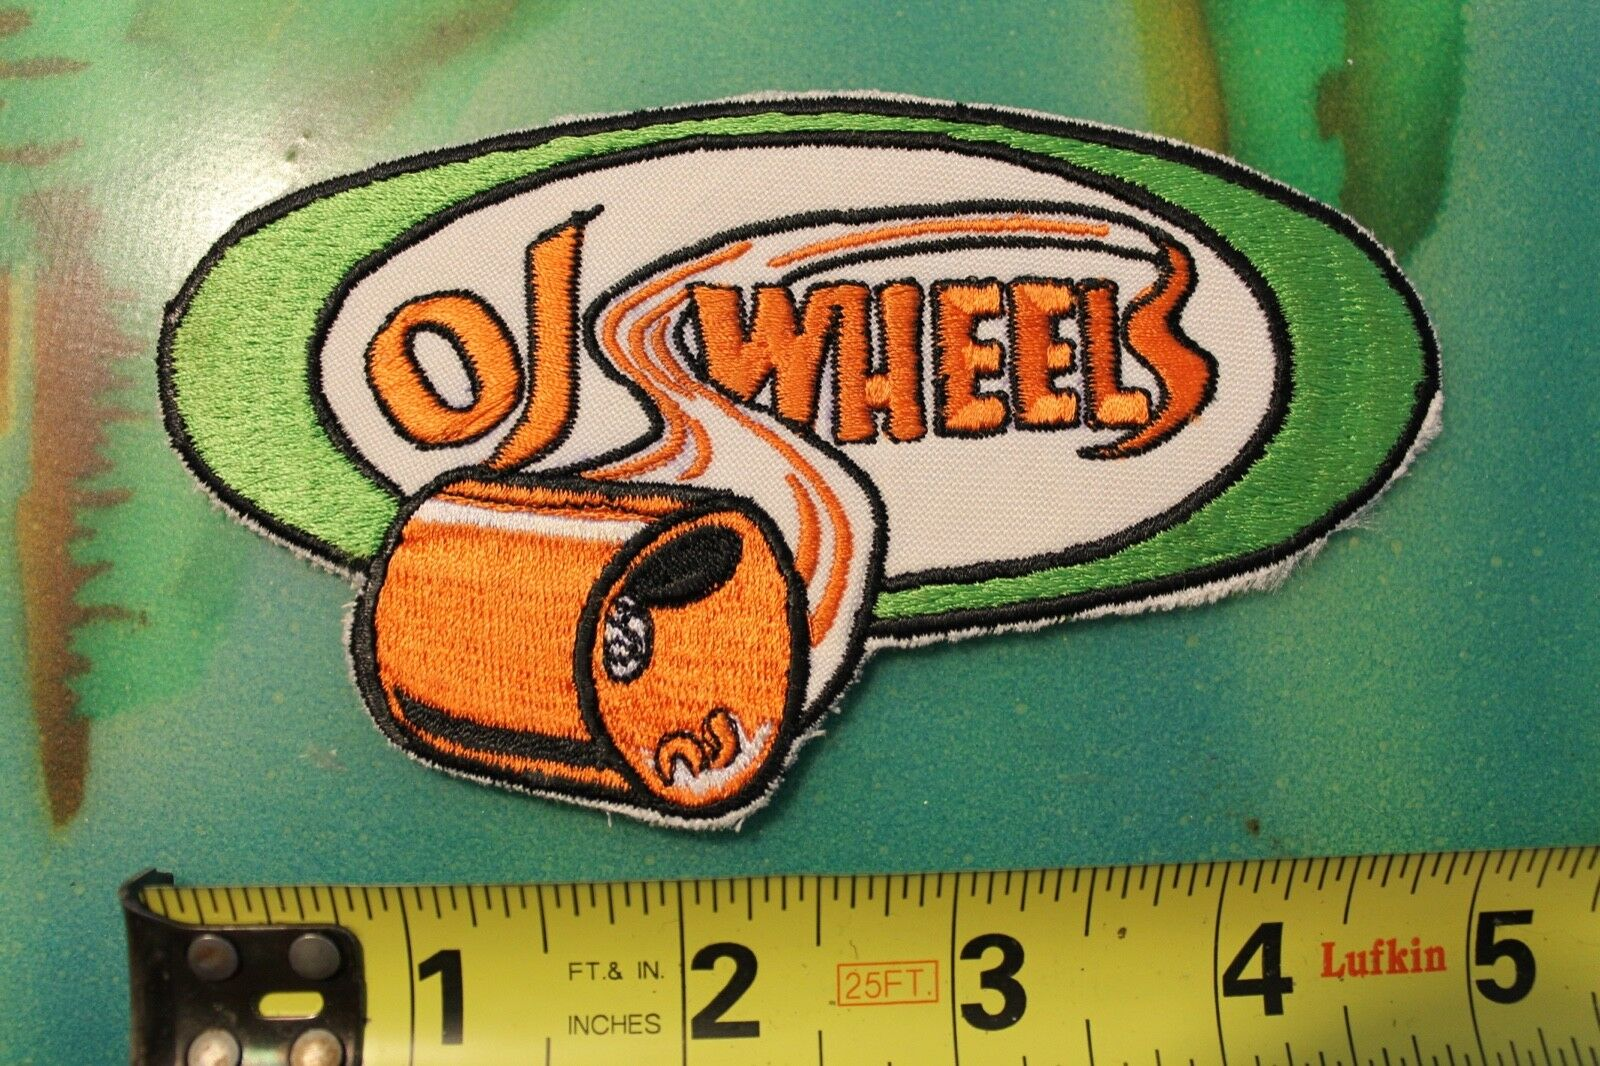 OJ Wheels Santa Cruz S  boards Classic 70's NOS Rare Original Vintage PATCH  latest styles